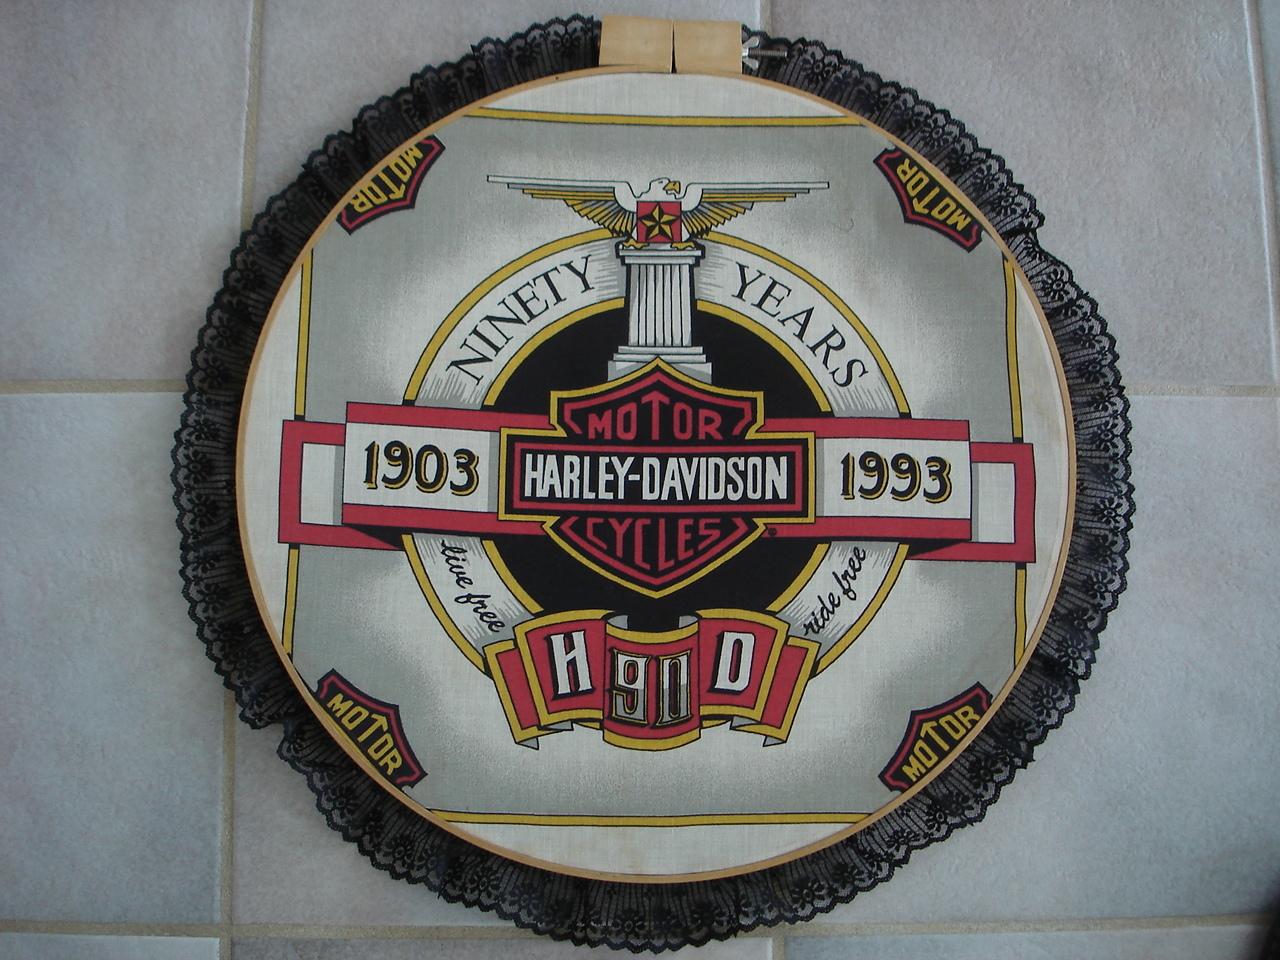 Harley Davidson Motor Cycle Scarf Wall Hanging Hoop, 1993